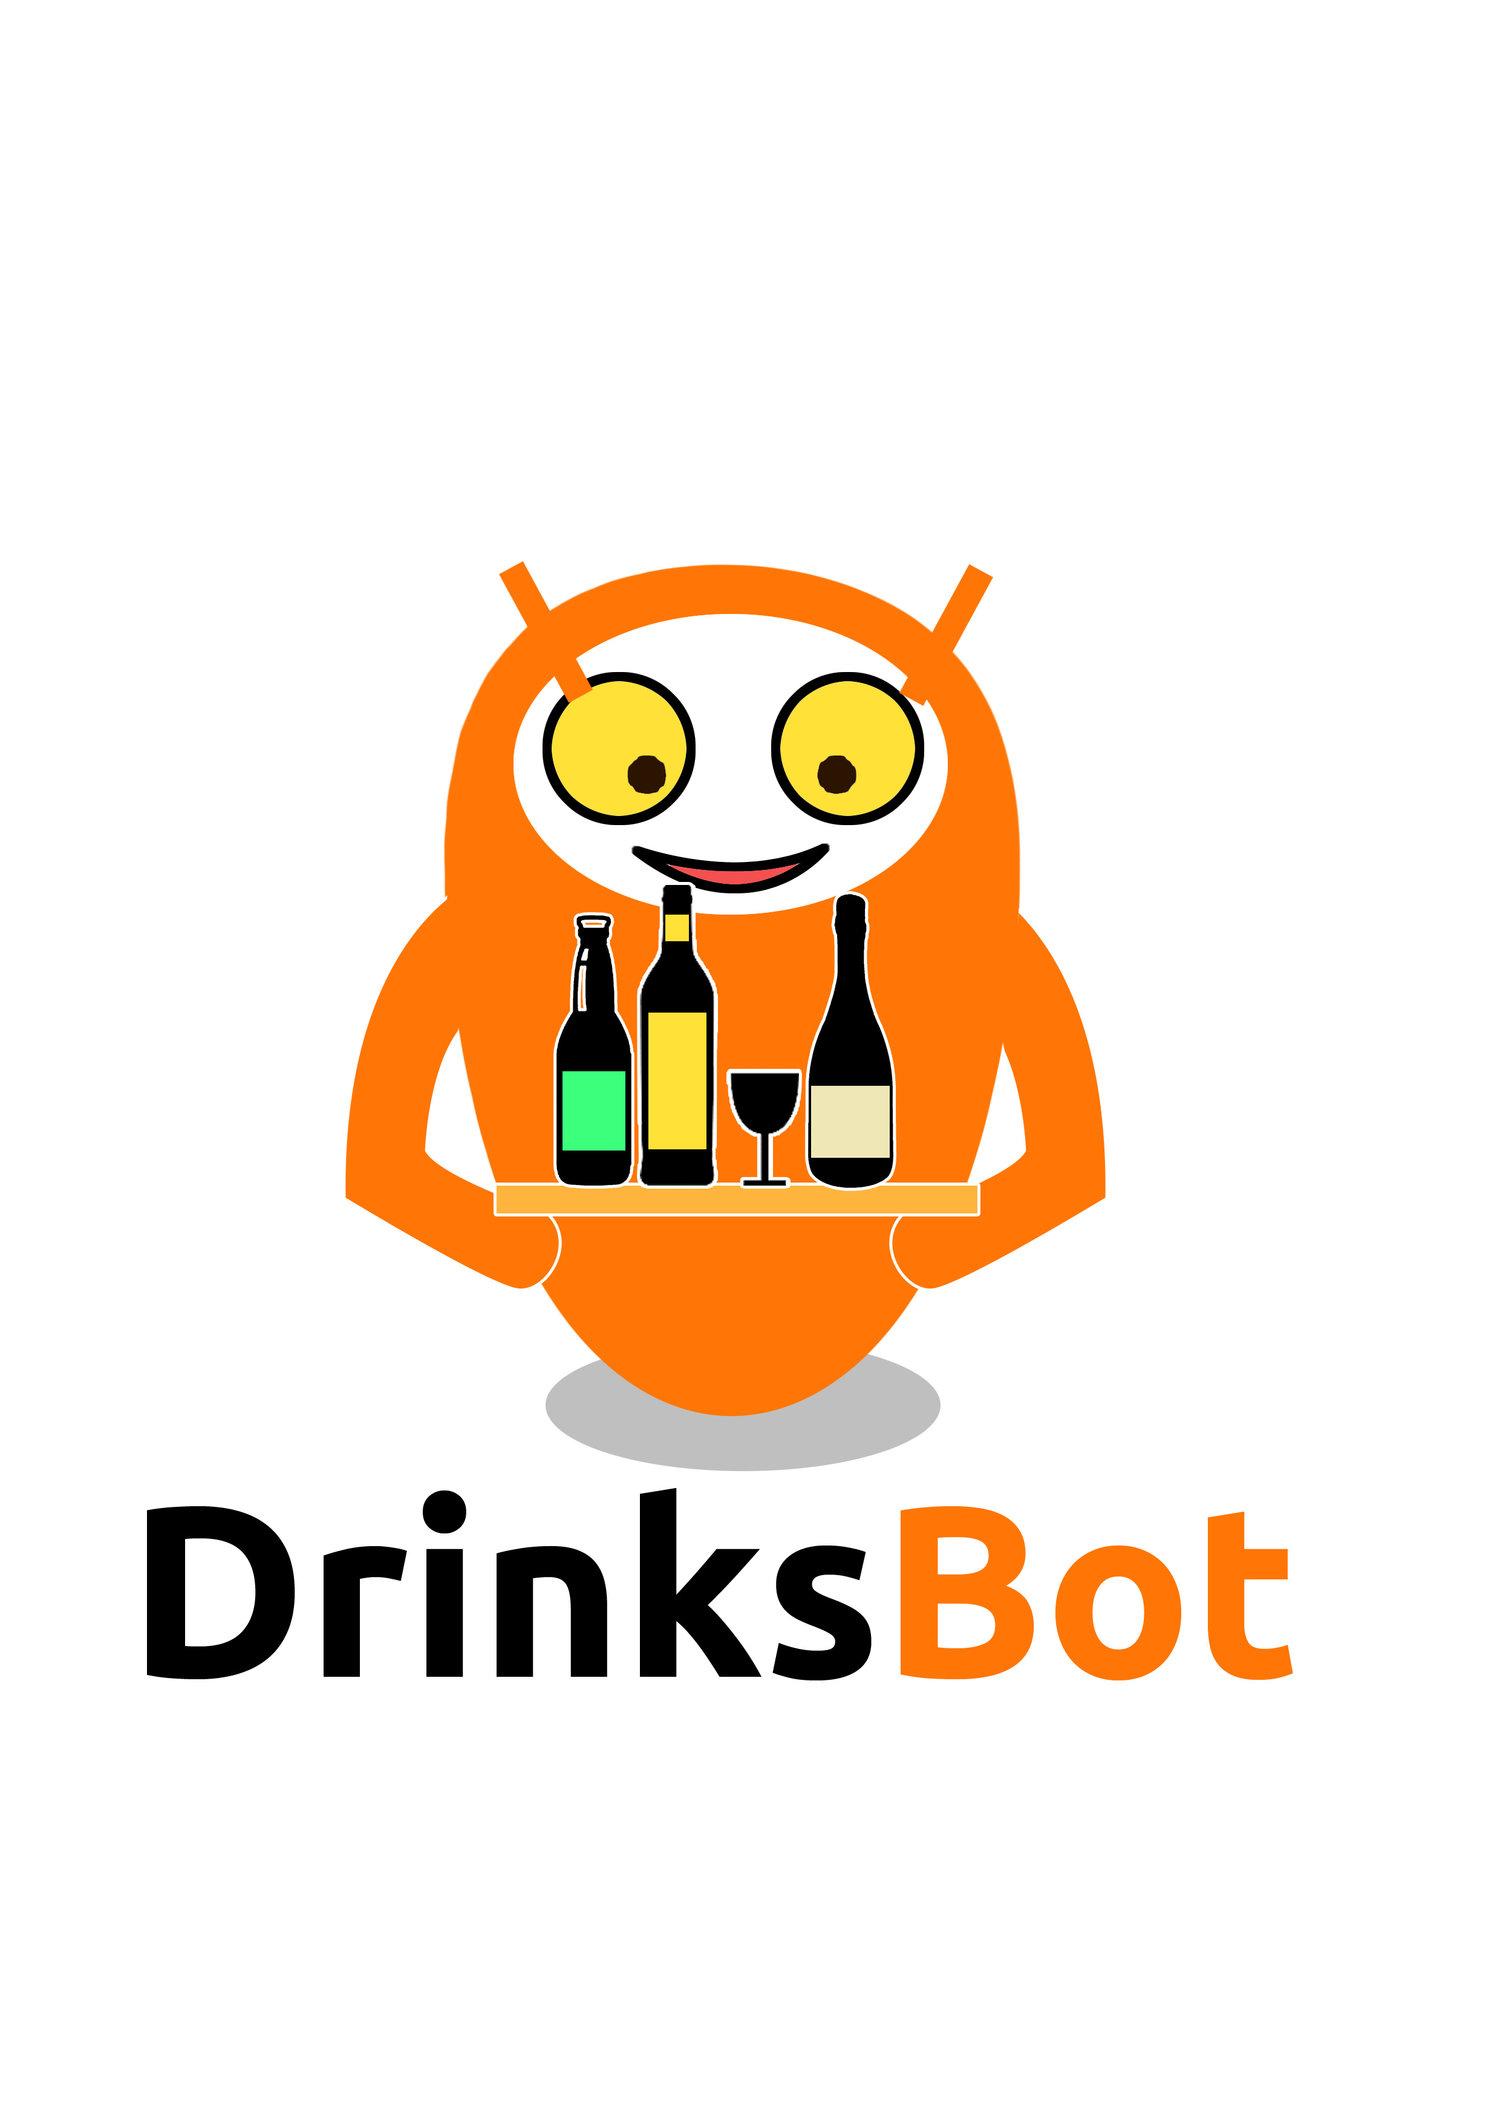 Drinks Robot — DrinksBot